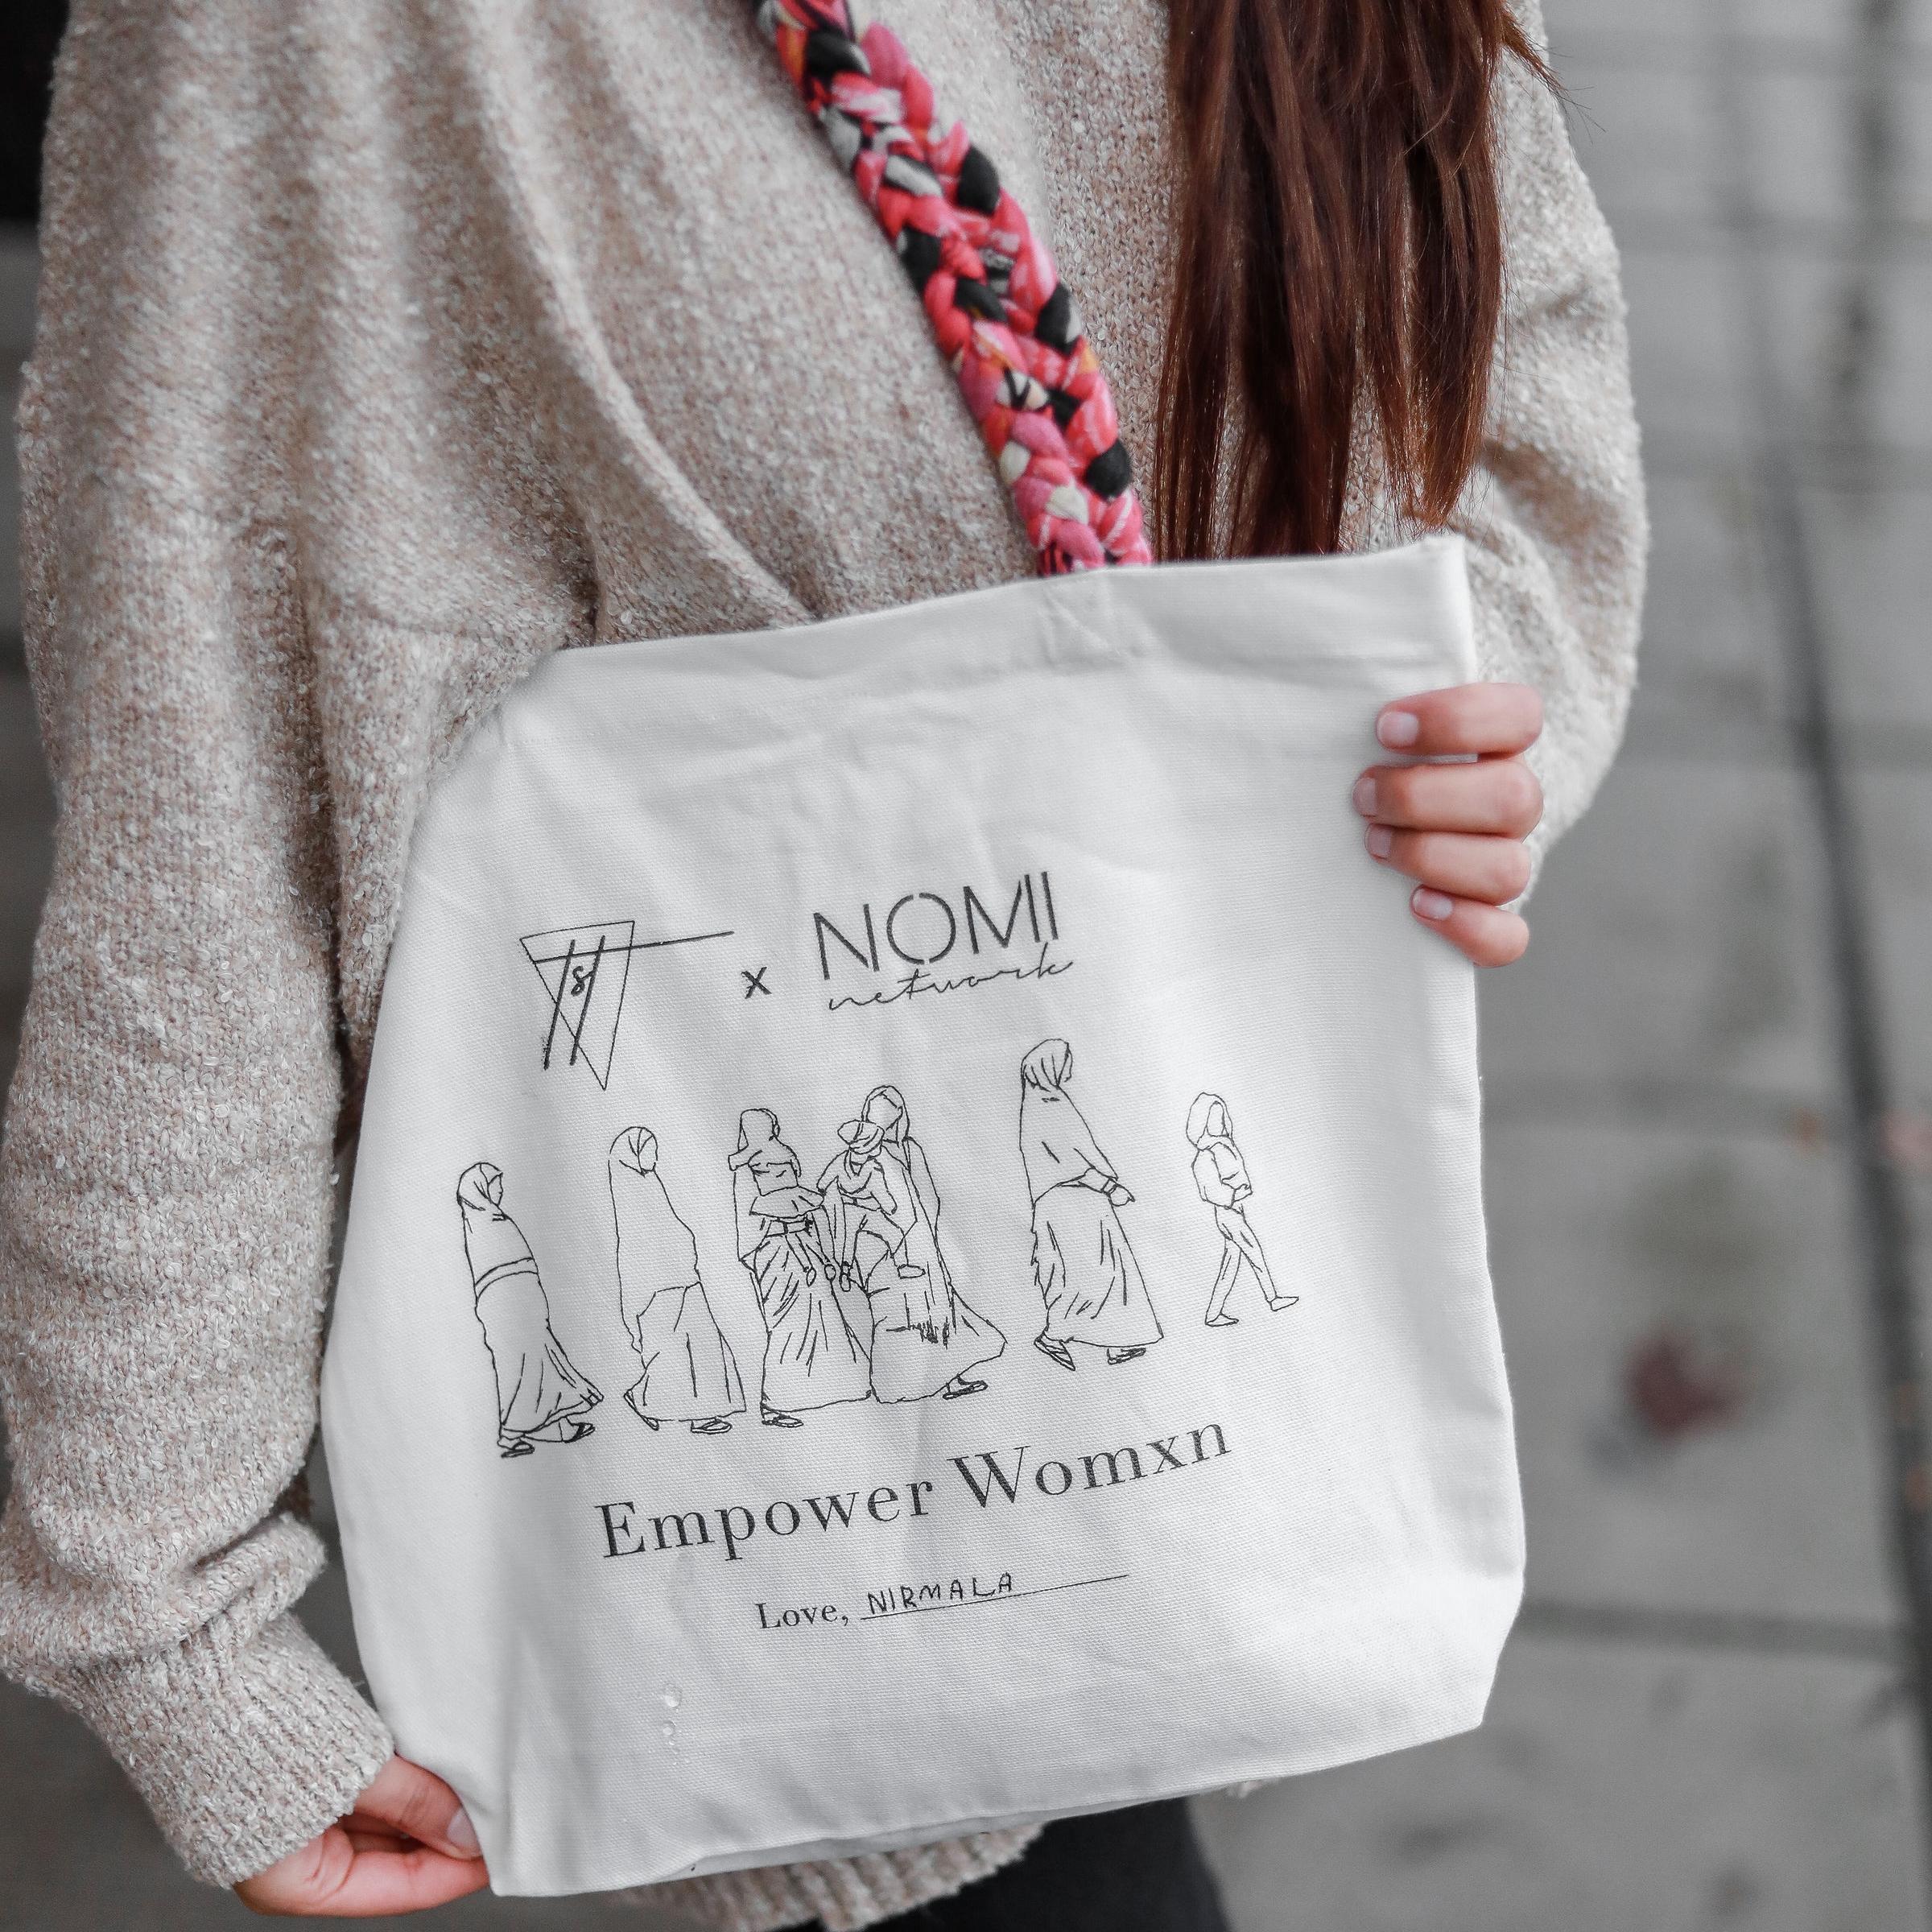 Empower Womxn Tote by Nomi Network x Sanaya Set